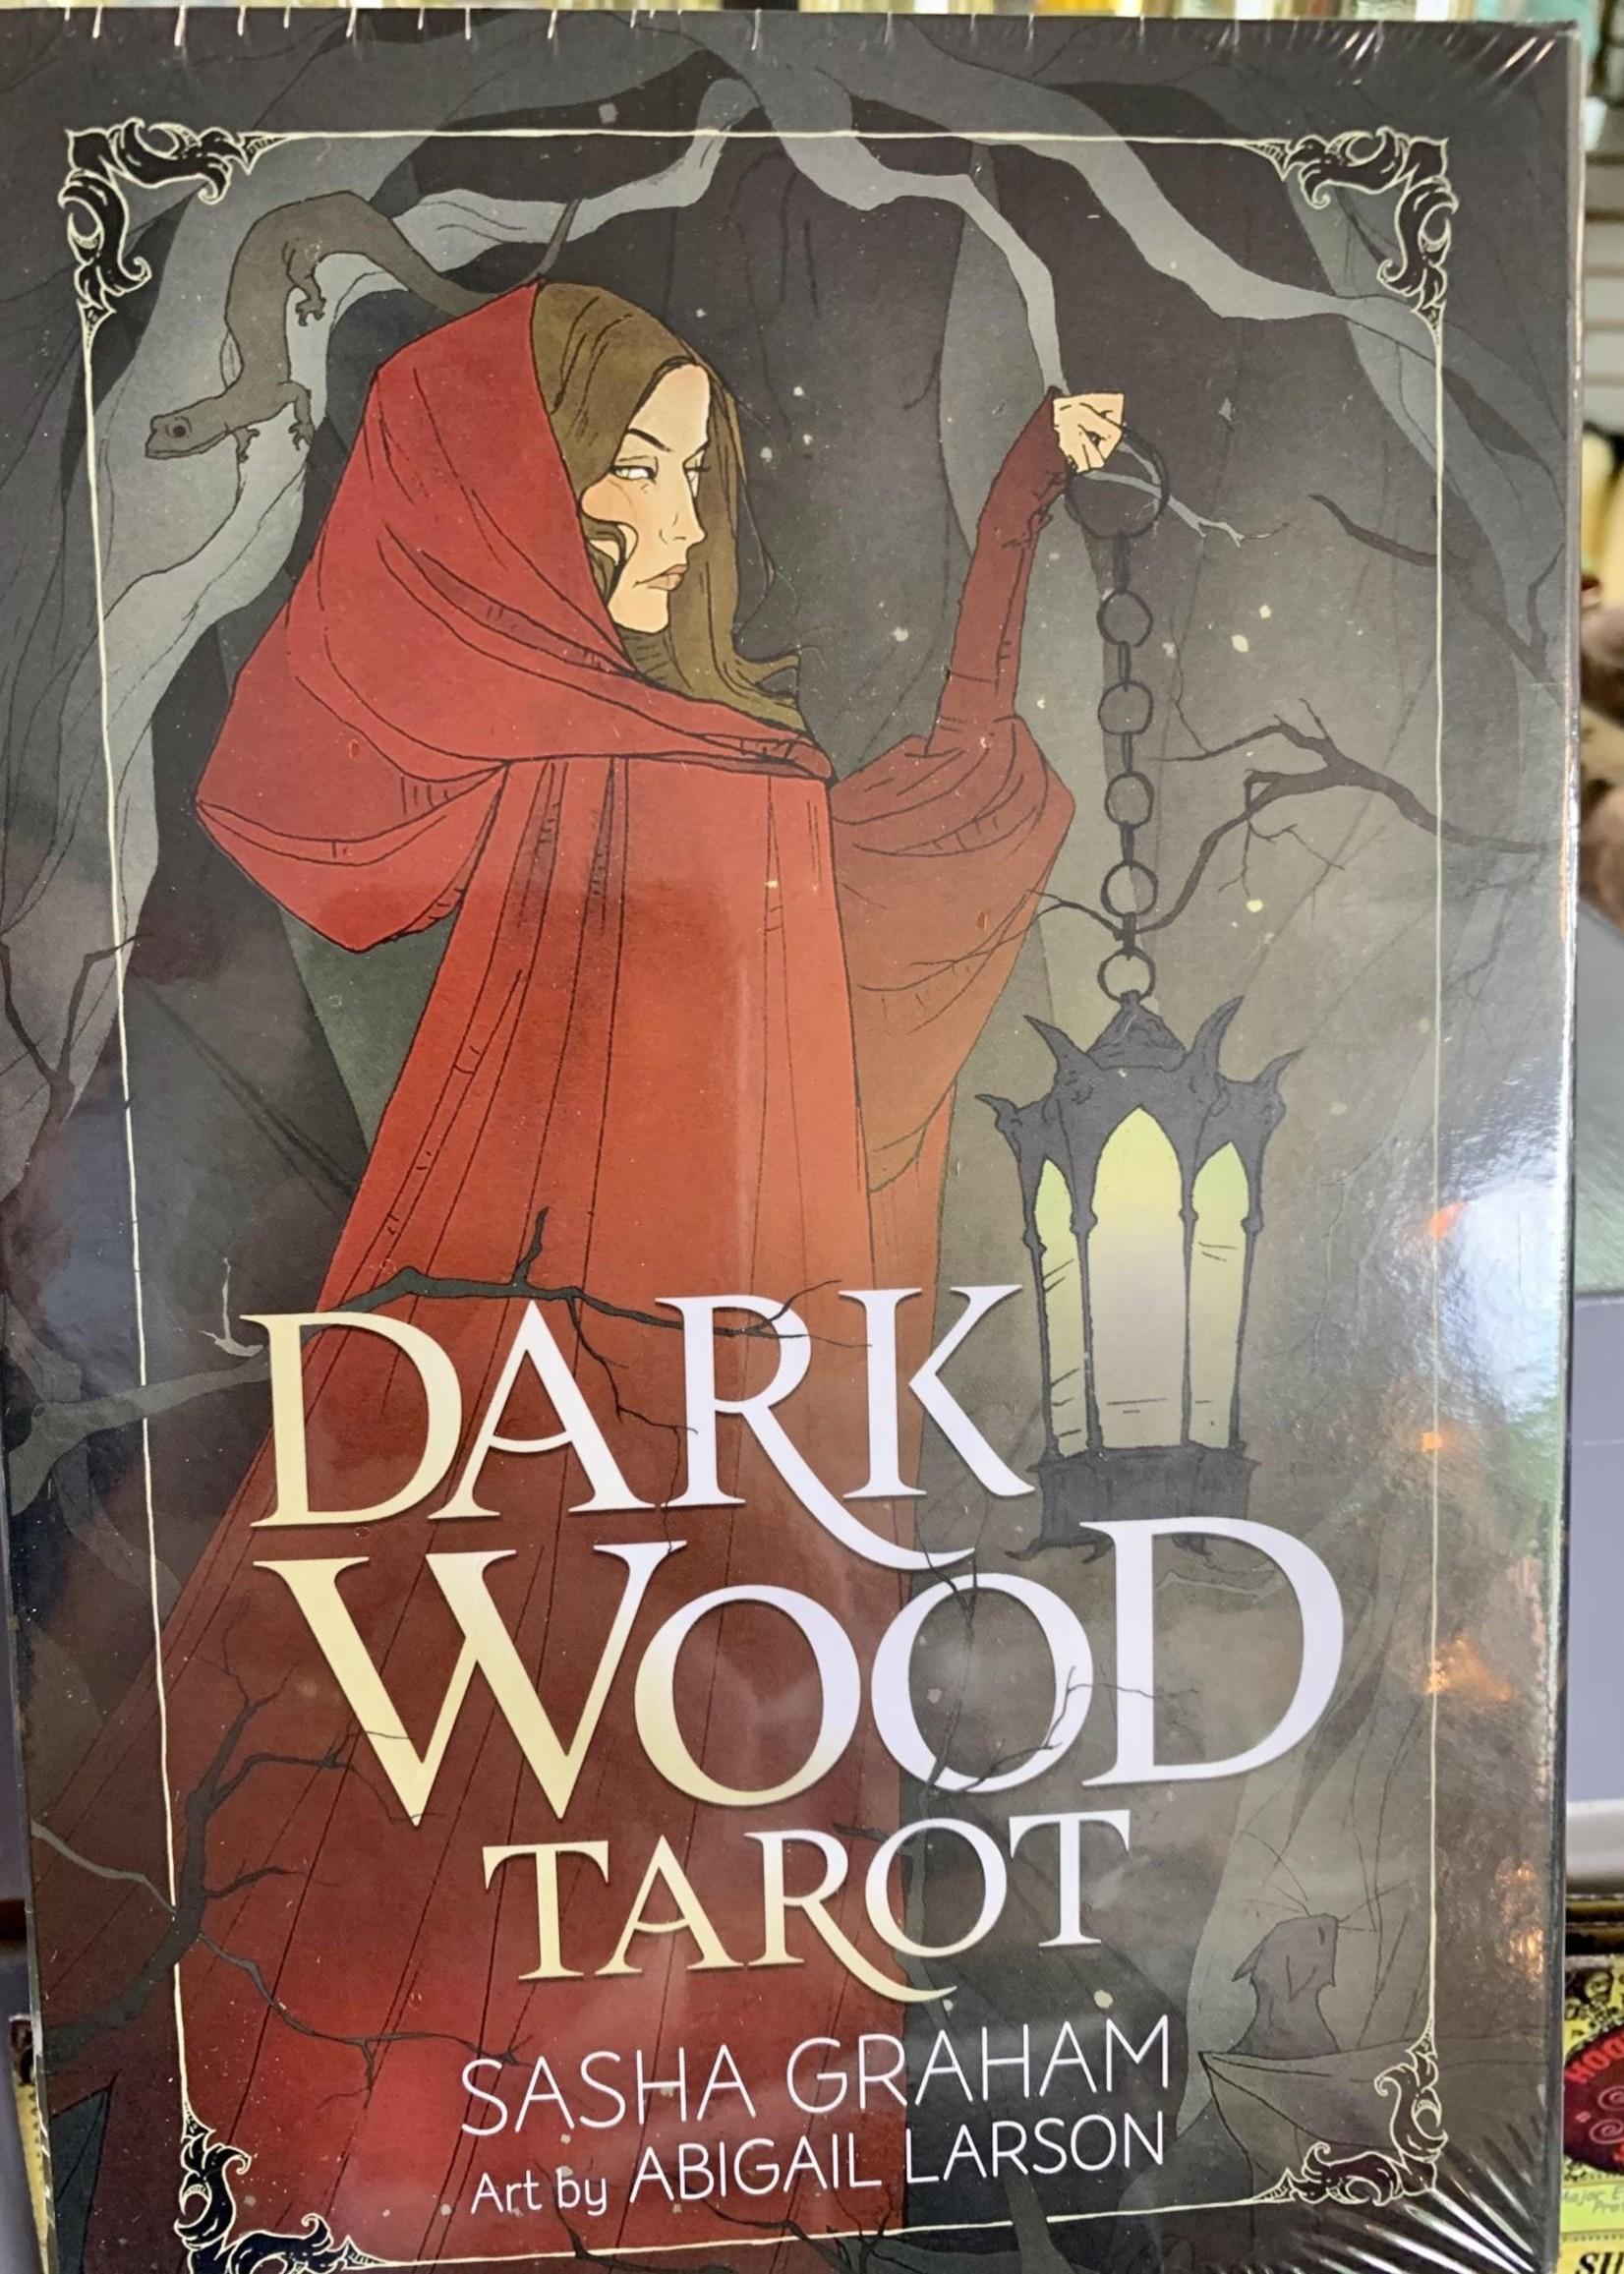 Dark Wood Tarot - Sasha Graham